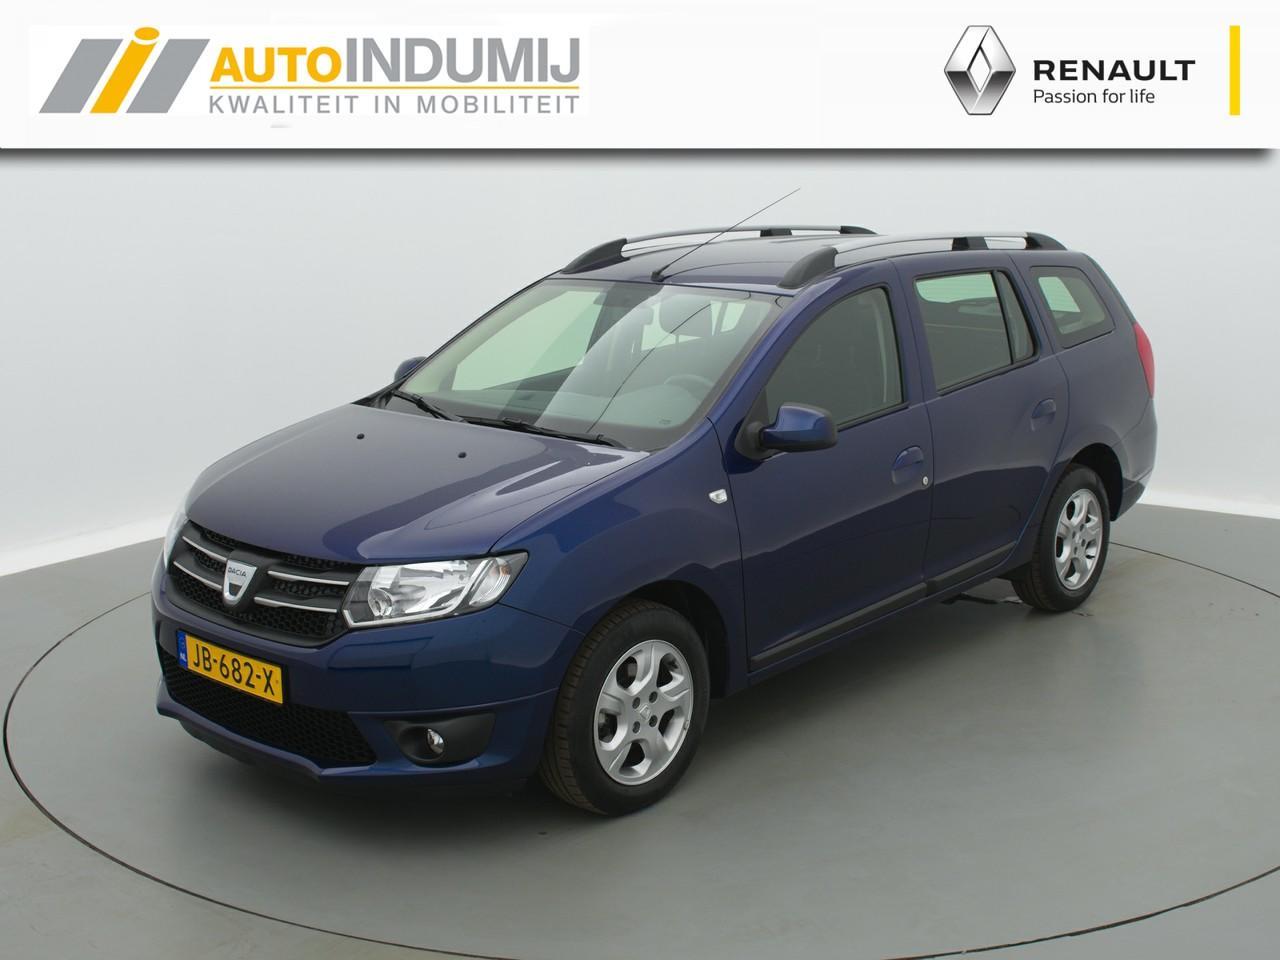 Dacia Logan Mcv tce 90 prestige / airco / navigatie / parkeersensor / lichtmetaal